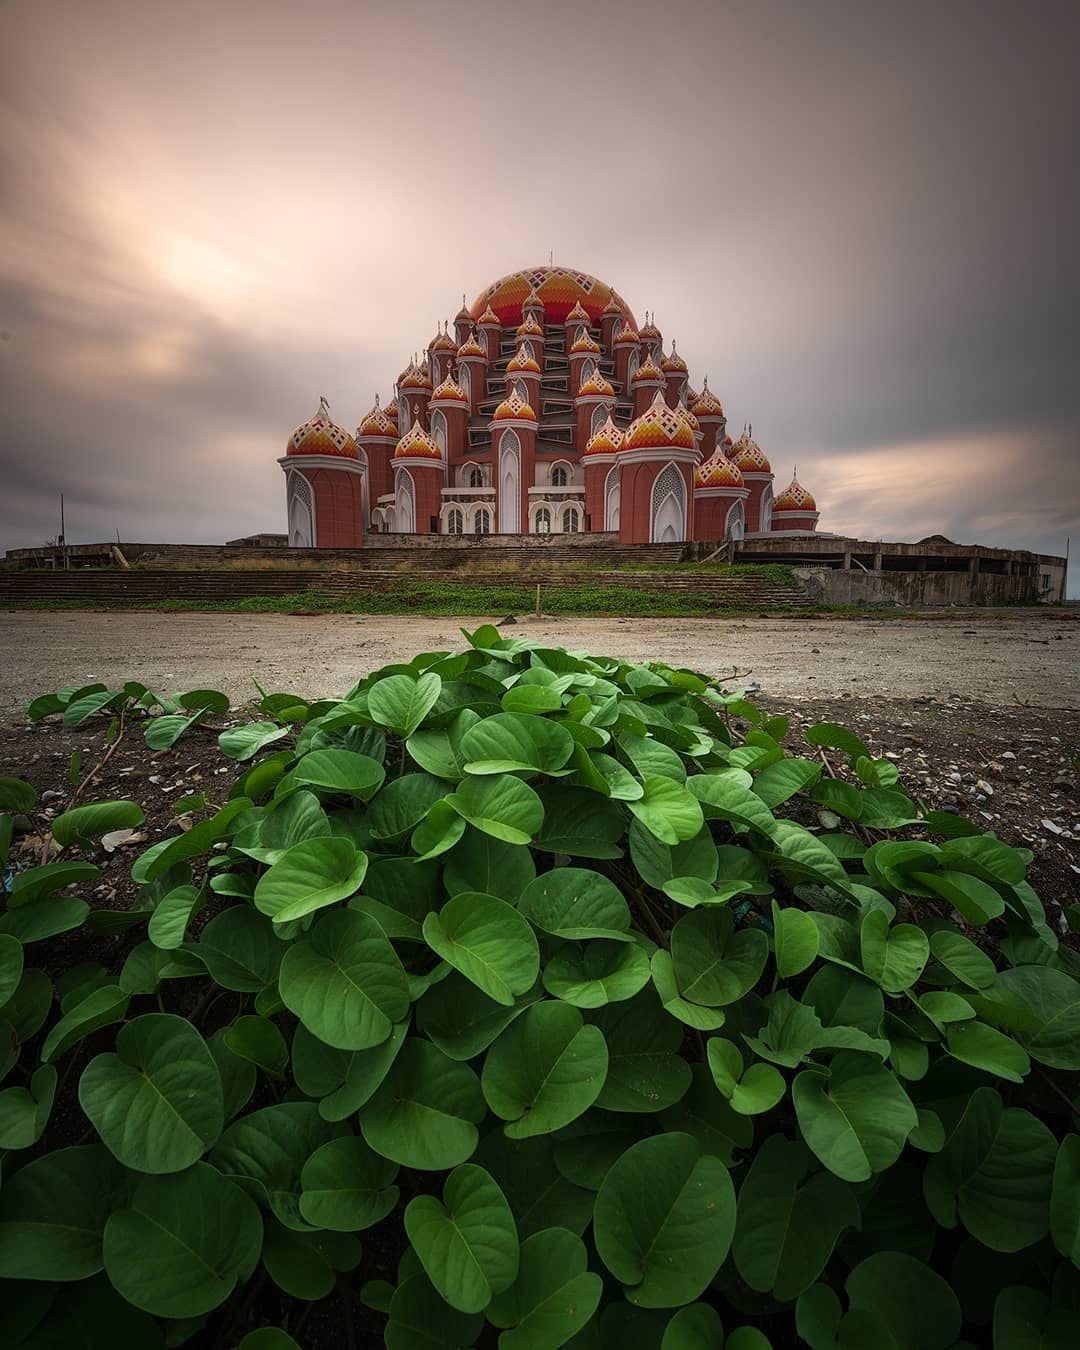 Chandra Indonesia On Instagram Masjid 99 Kubah Center Point Of Indonesia Loc Makasar Indonesia Join Greatshotz In 2020 Masjid Instagram Indonesia